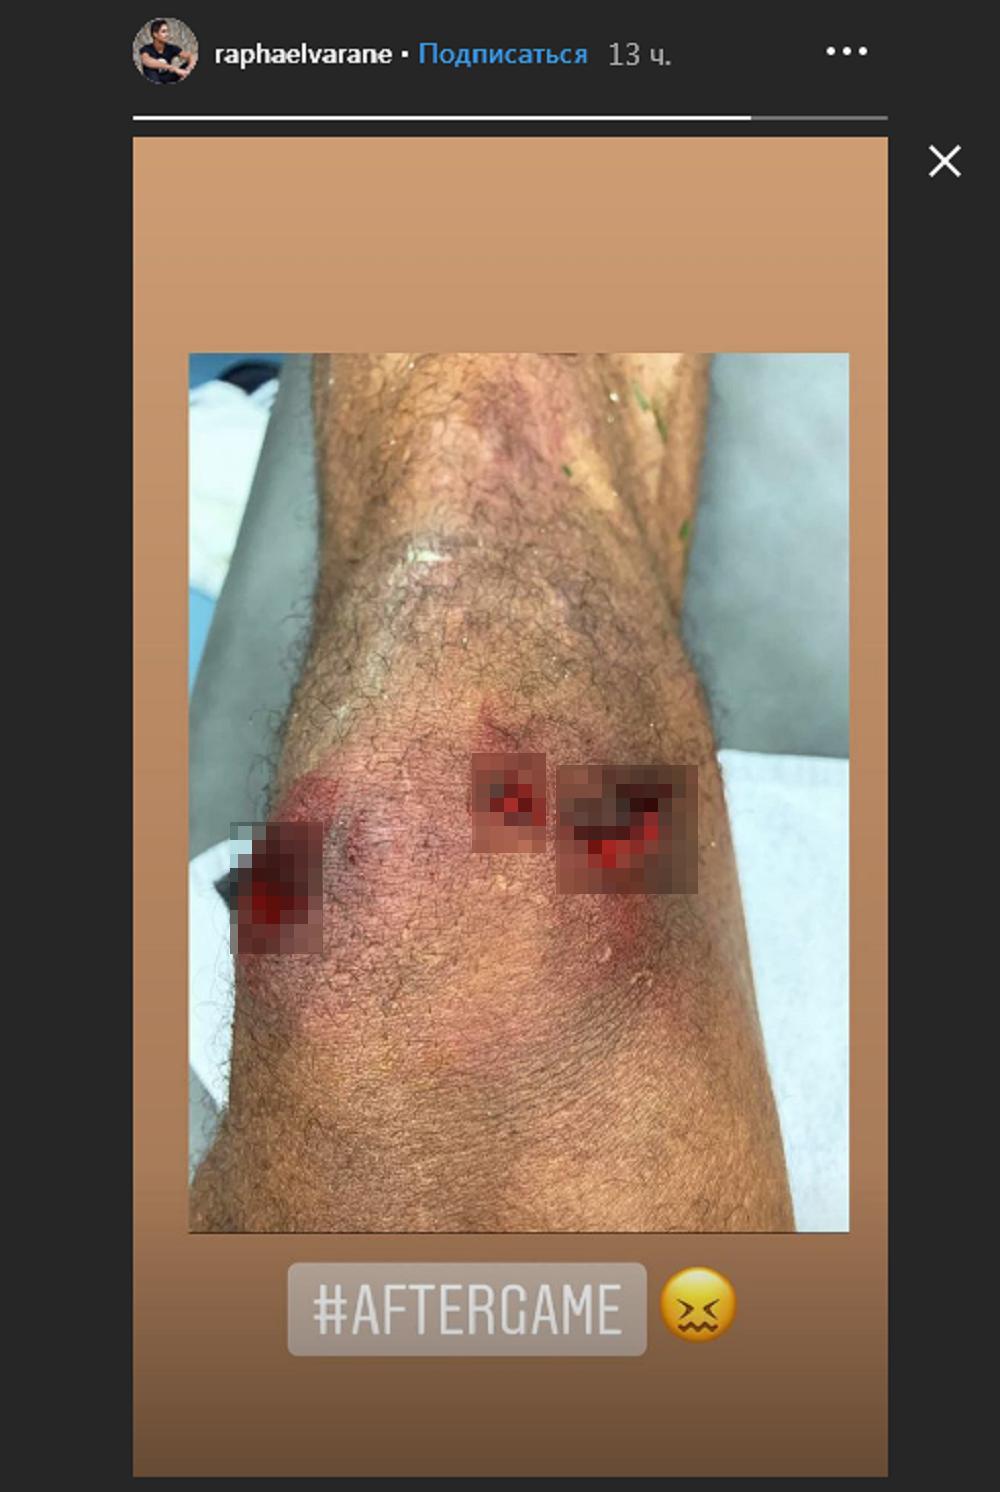 اصابة فاران لاعب ريال مدريد